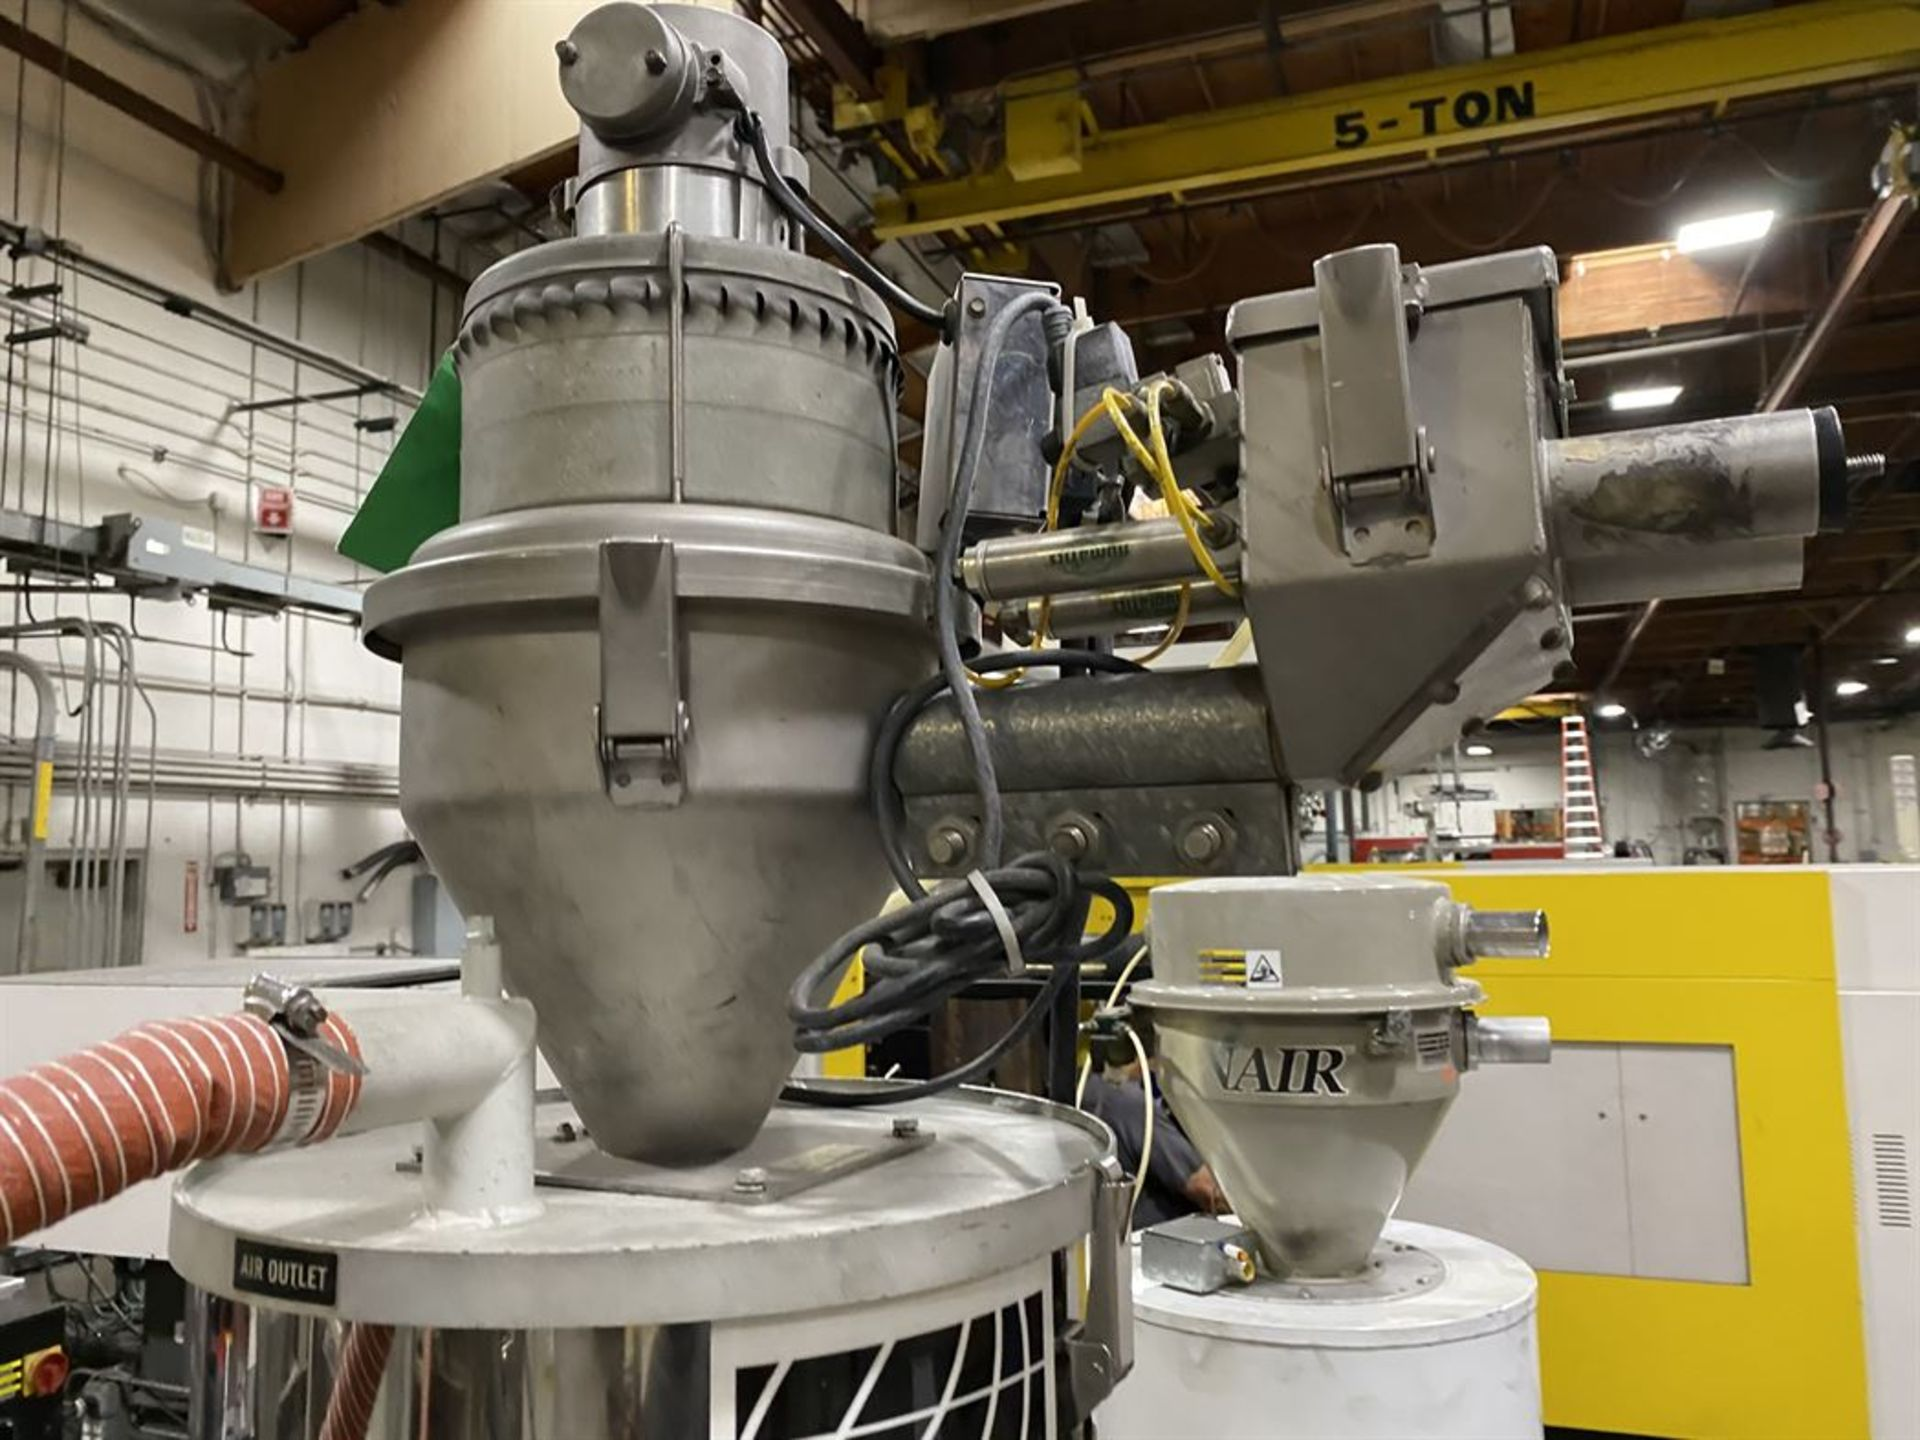 Lot 223 - Cincinnati Milacron M-GS-60 Hopper Dryer System, s/n 3933A01-05-47, w/ Vacuum Loader